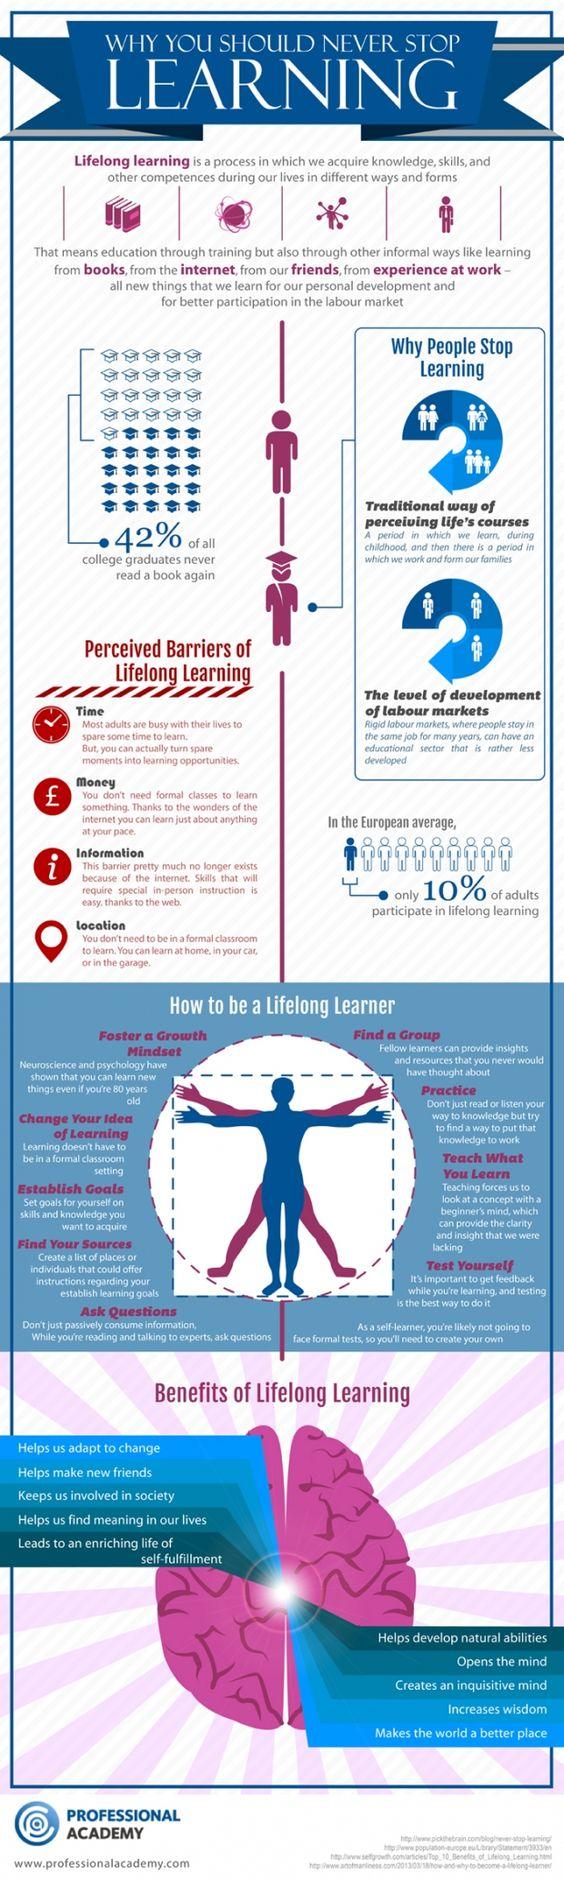 Lifelong Learning Infographic